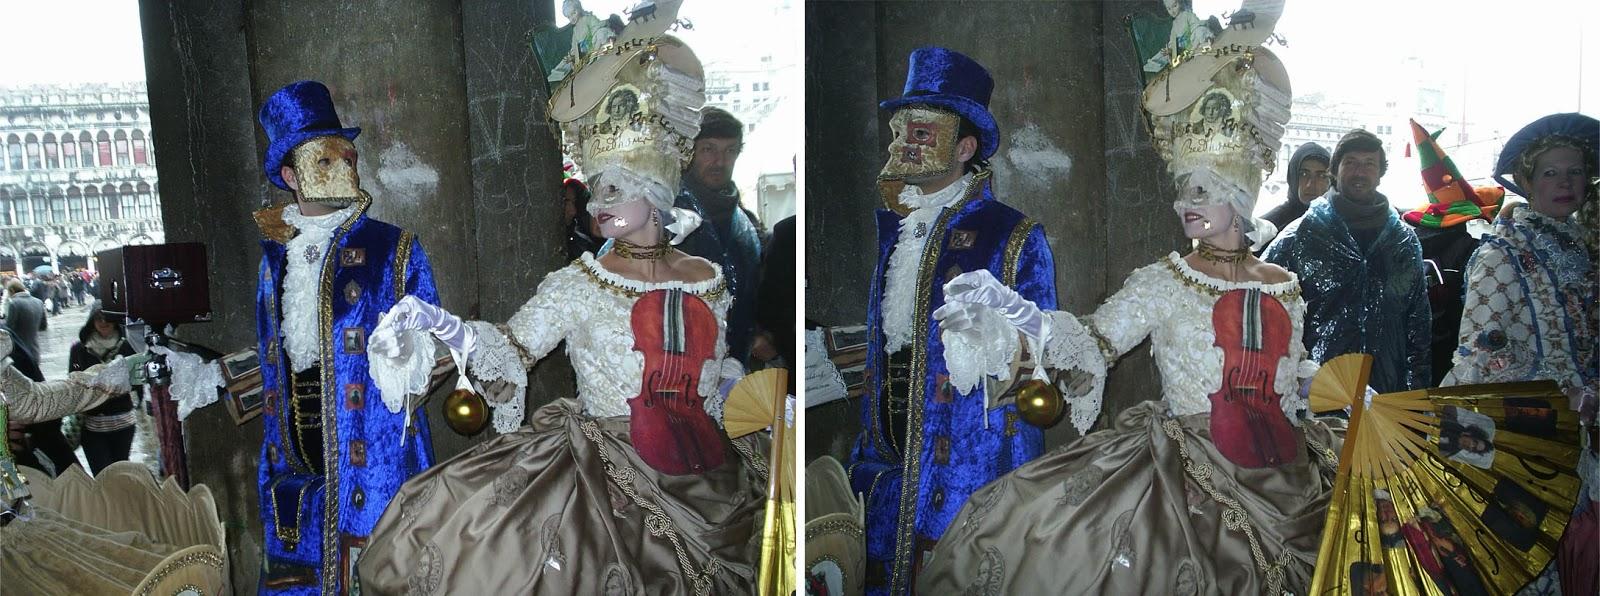 Carbaval Venecia, música,